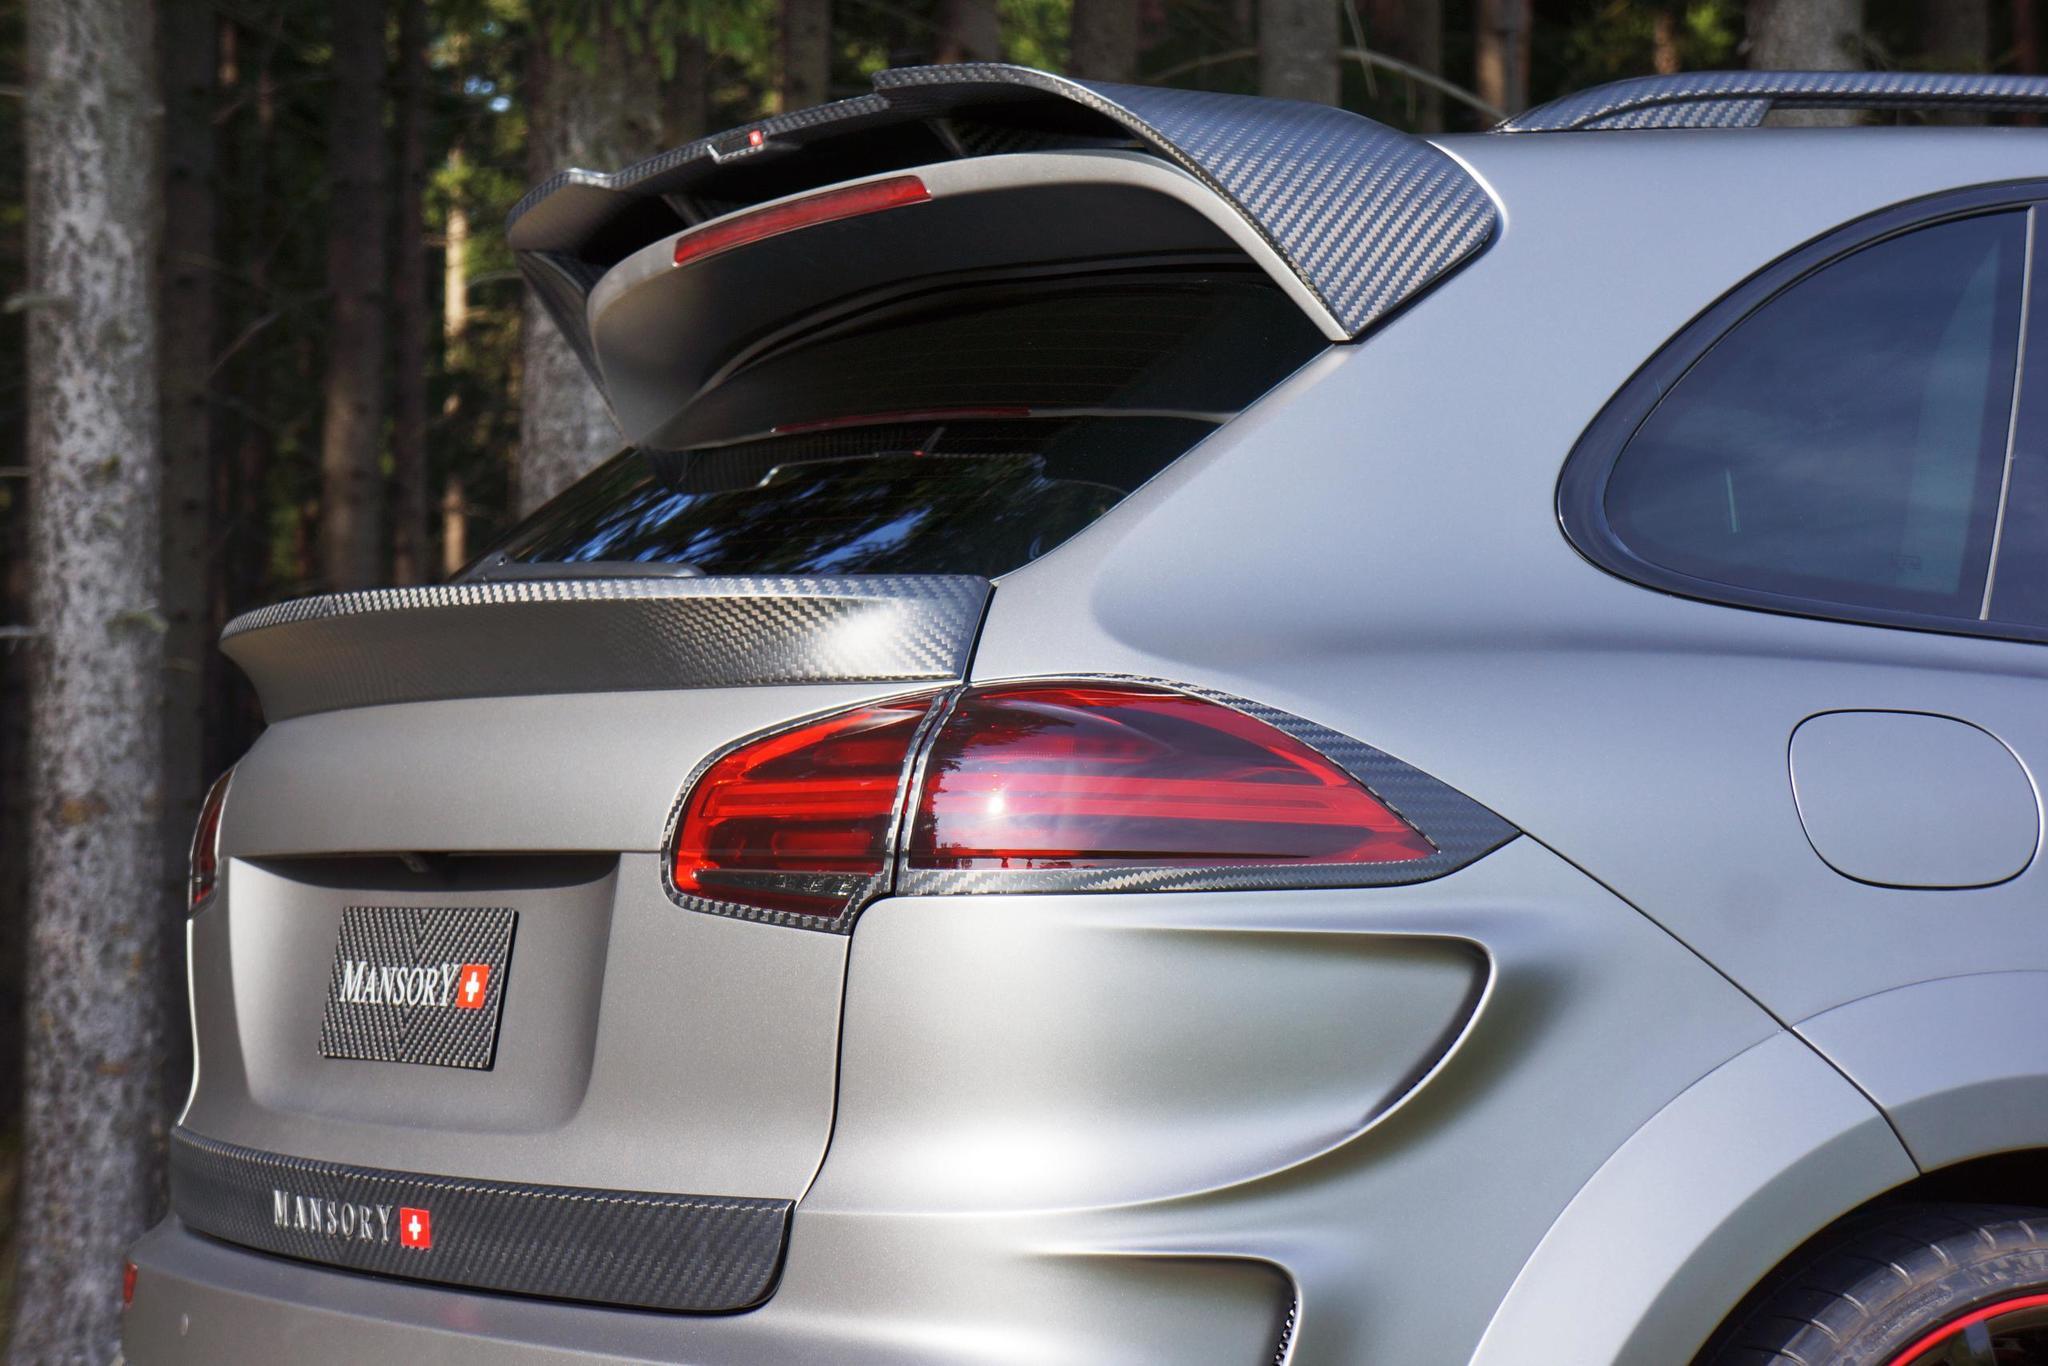 Mansory body kit for Porsche Cayenne carbon